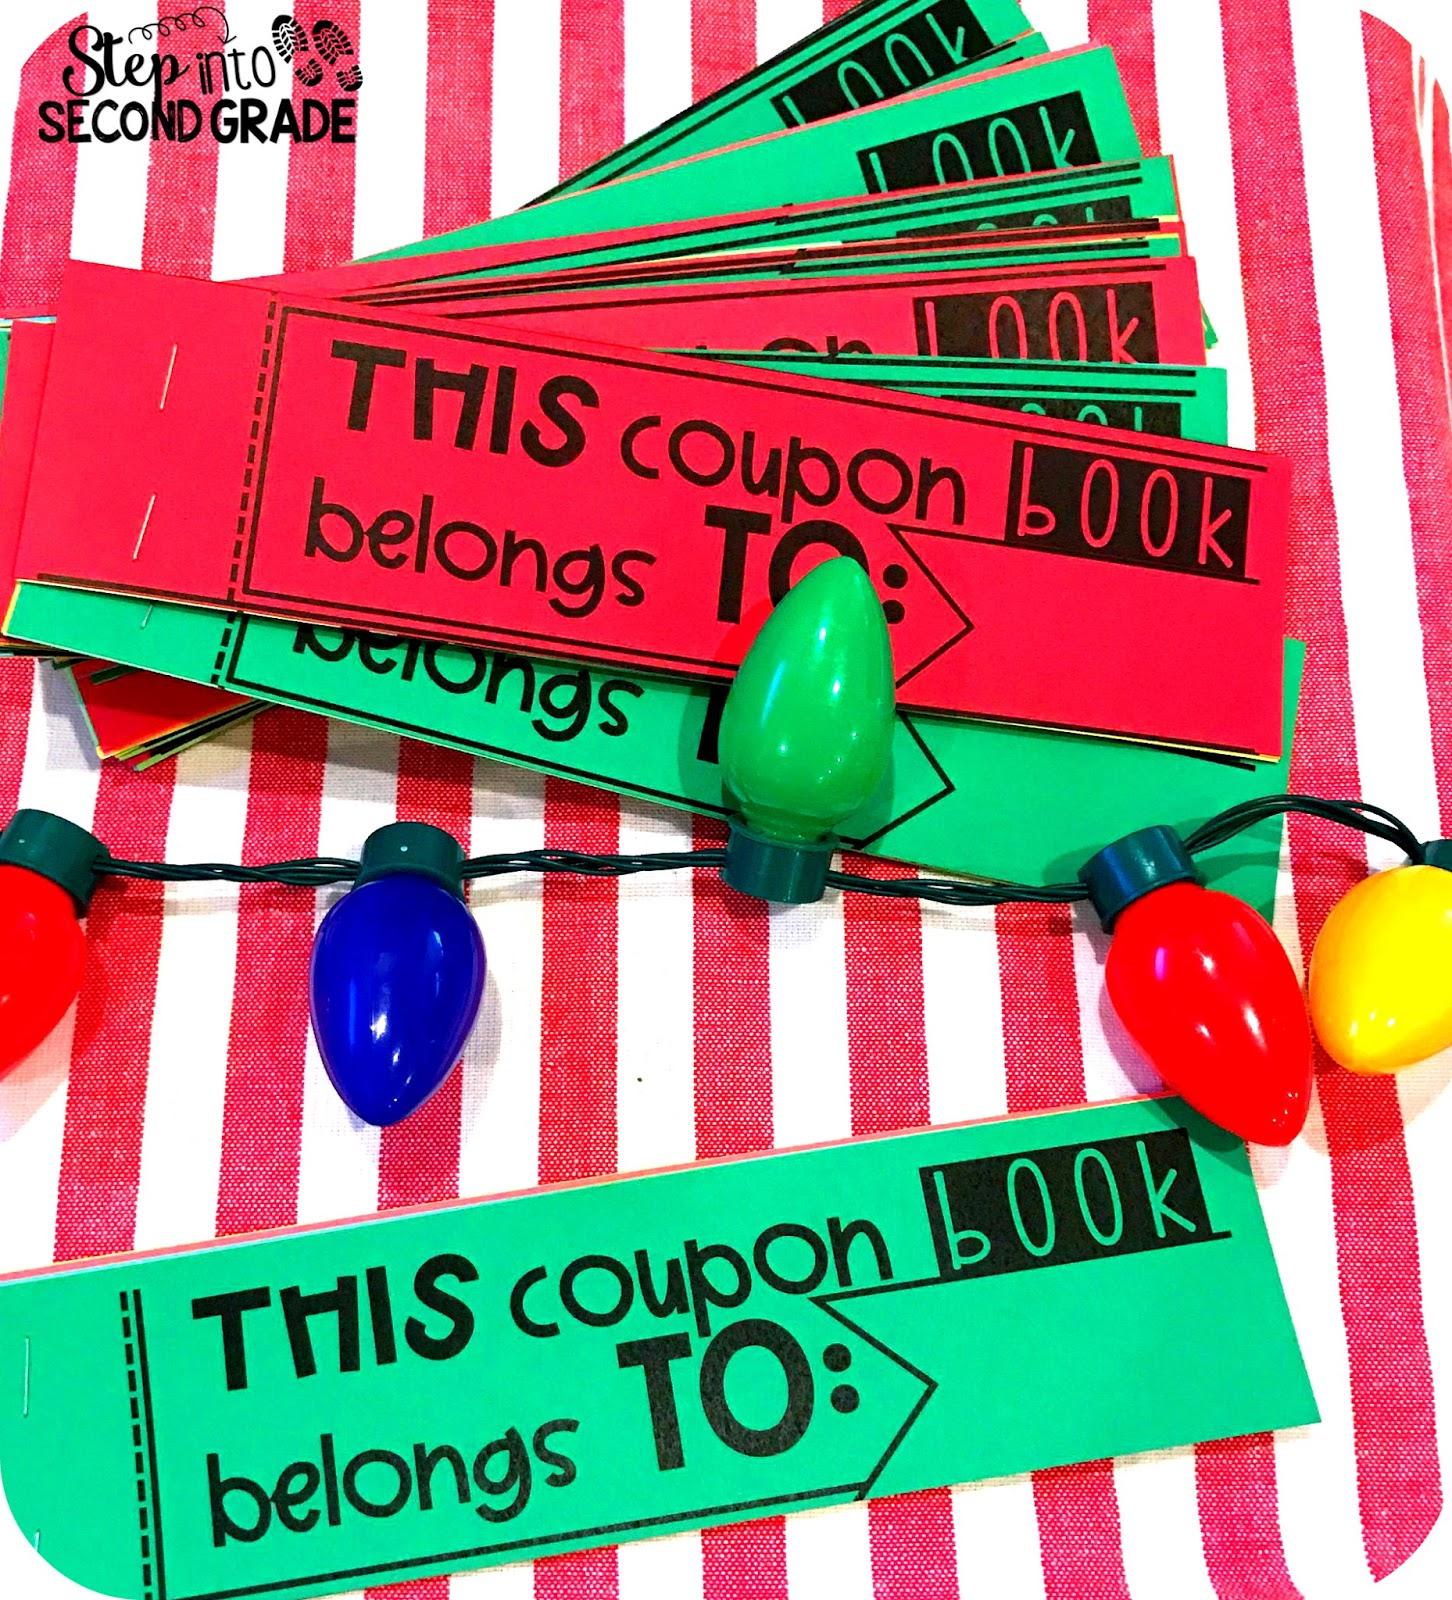 Student coupon book calgary